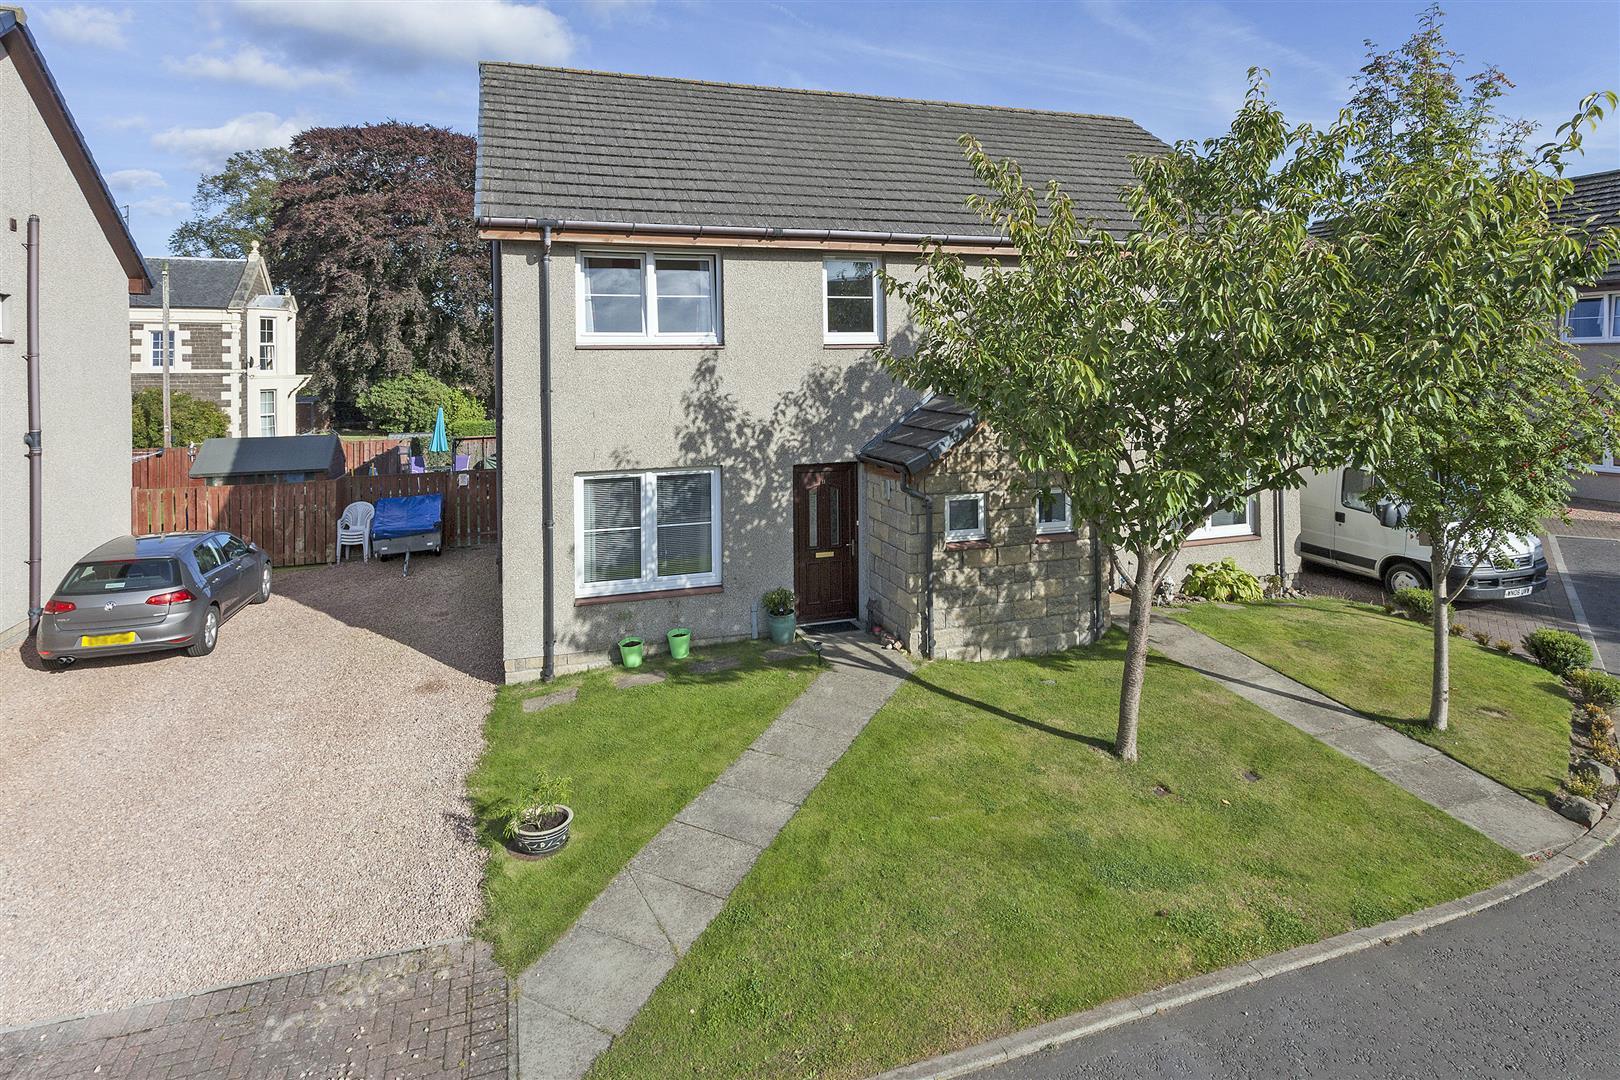 11, Moncrieff Way, Newburgh, Fife, KY14 6EF, UK